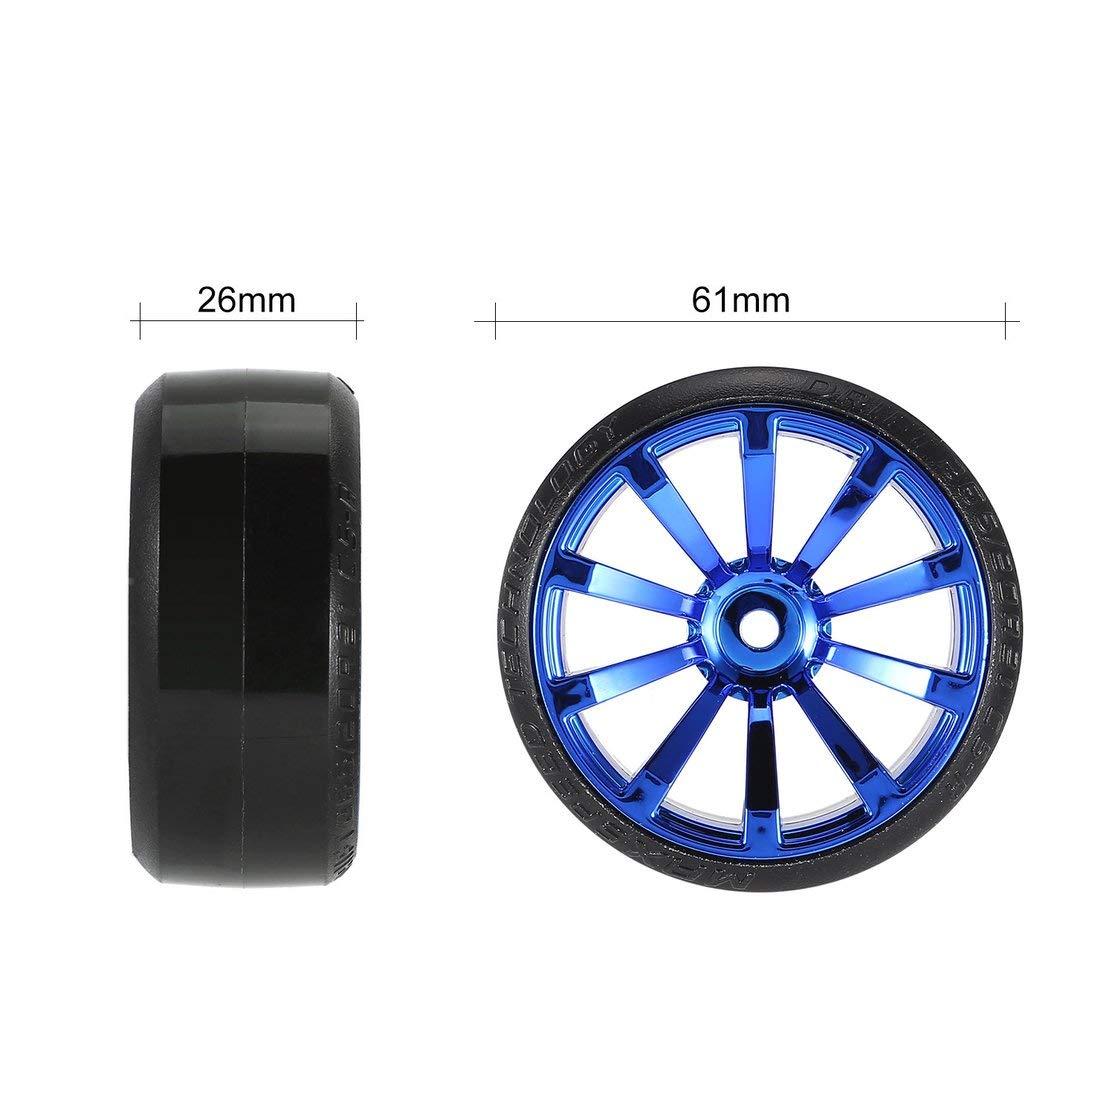 Candybush 4Pcs 1//10 RC Drift Car Tire Wheel Rim Hard Wheel Tyre for Traxxas HSP Tamiya HPI Kyosho On-Road Drifting Car RC Vehicle Part